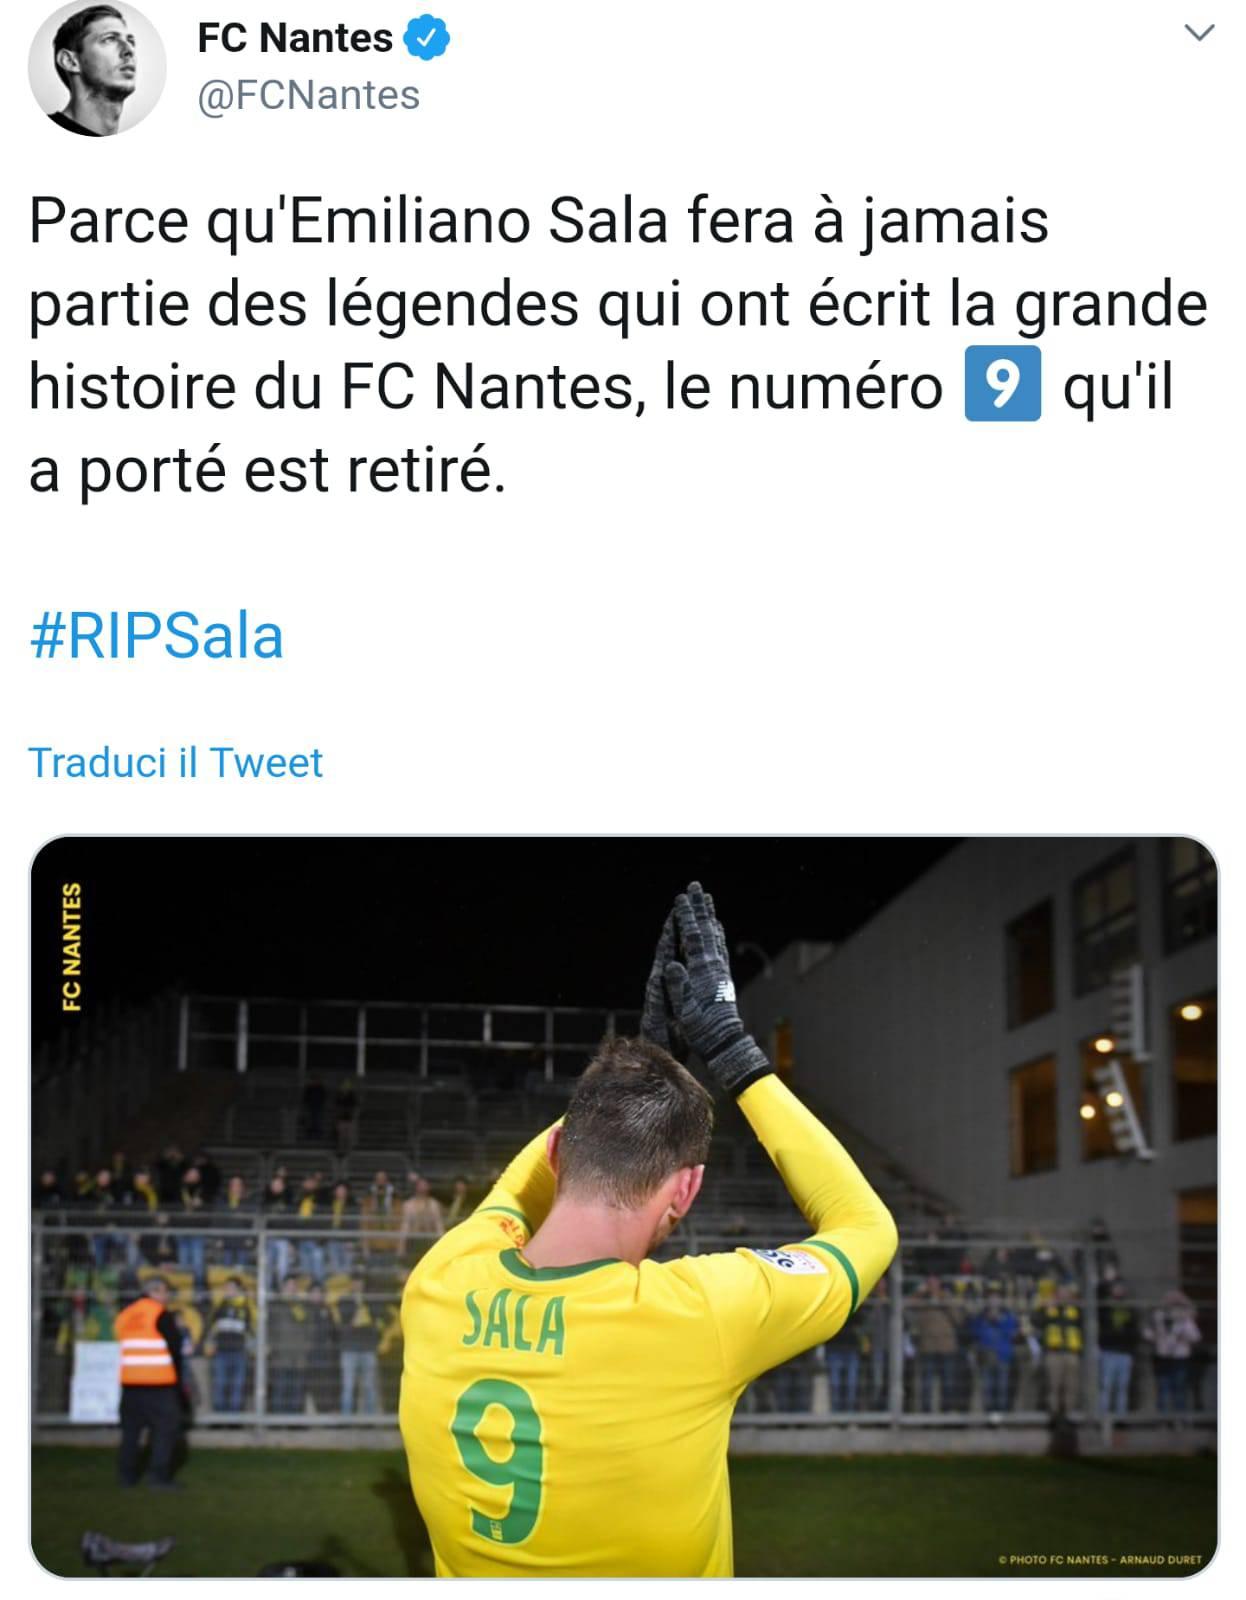 Emiliano Sala Nantes Ritiro Maglia